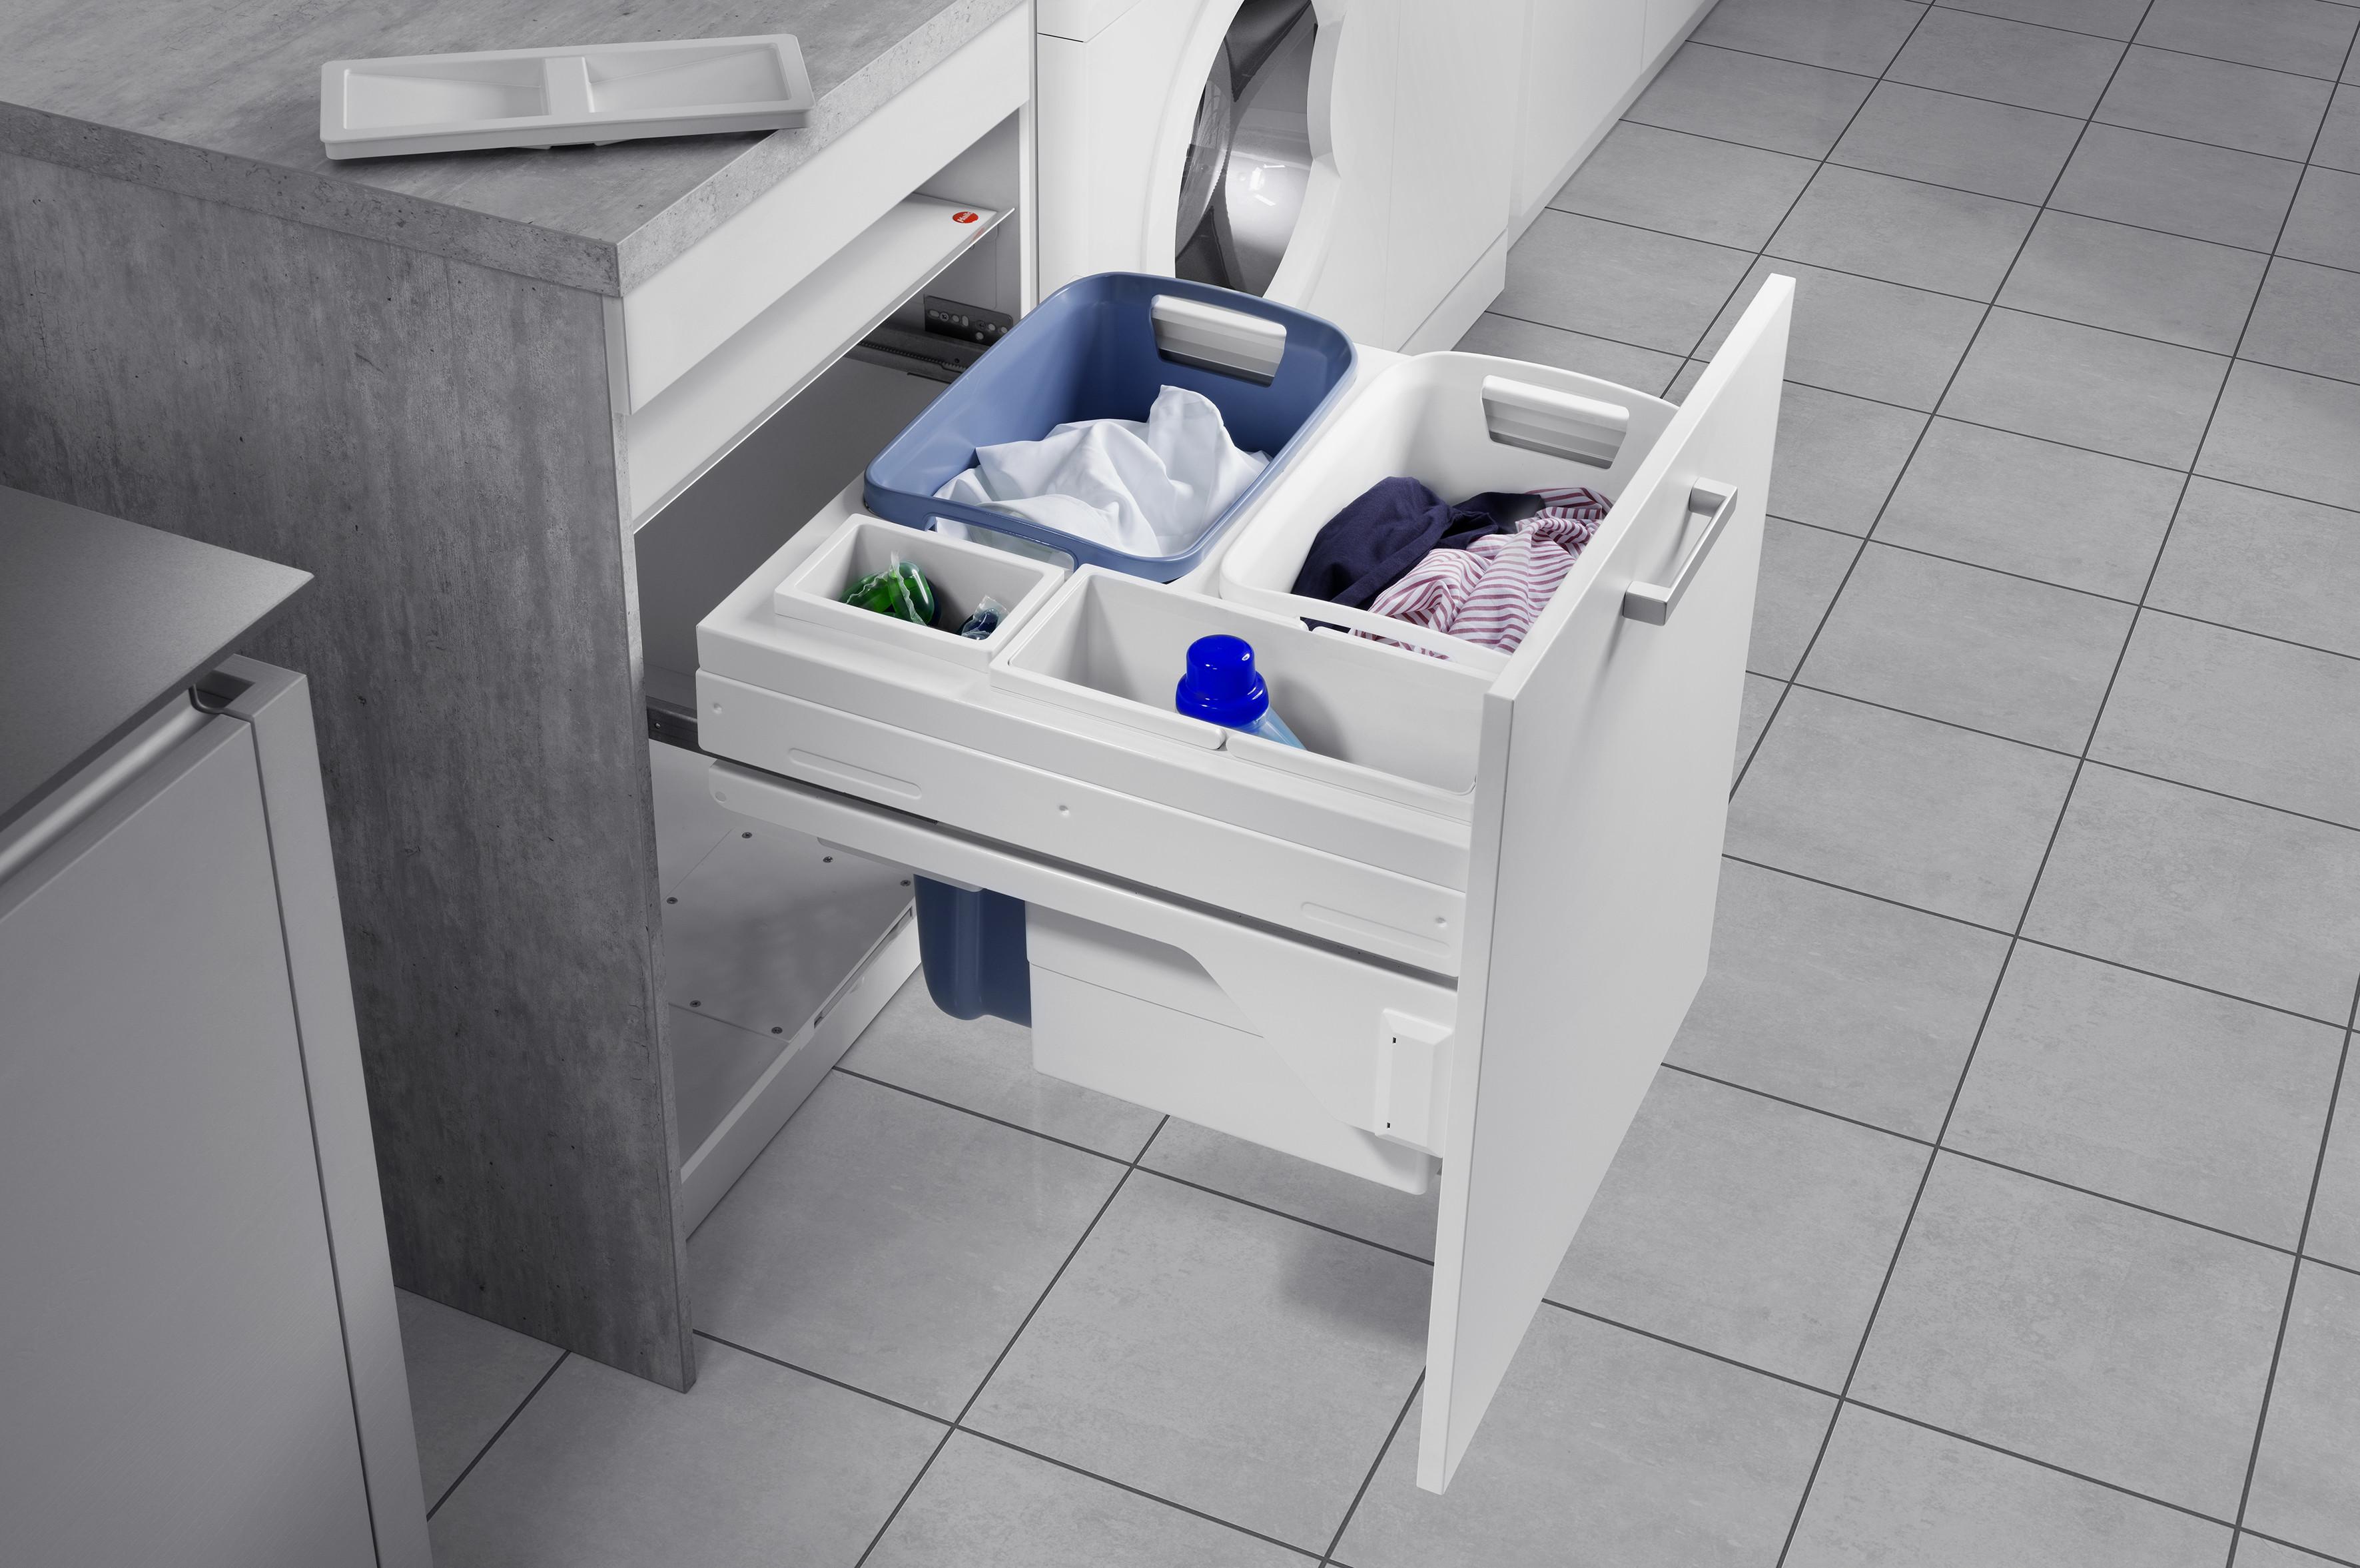 pantry box und laundry carrier von hailo umaxo. Black Bedroom Furniture Sets. Home Design Ideas